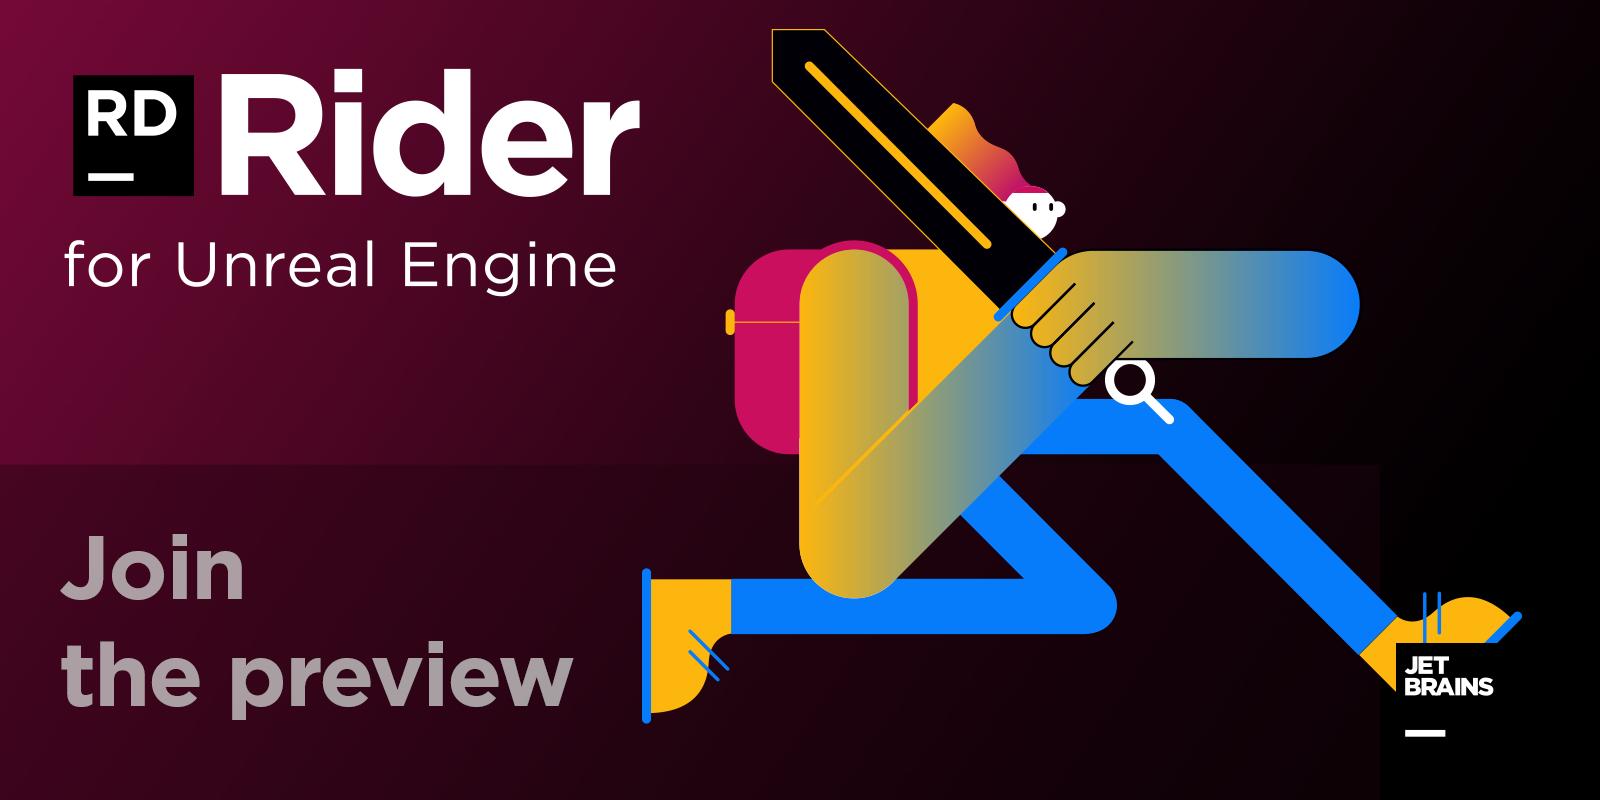 Public Preview de Rider for Unreal Engine